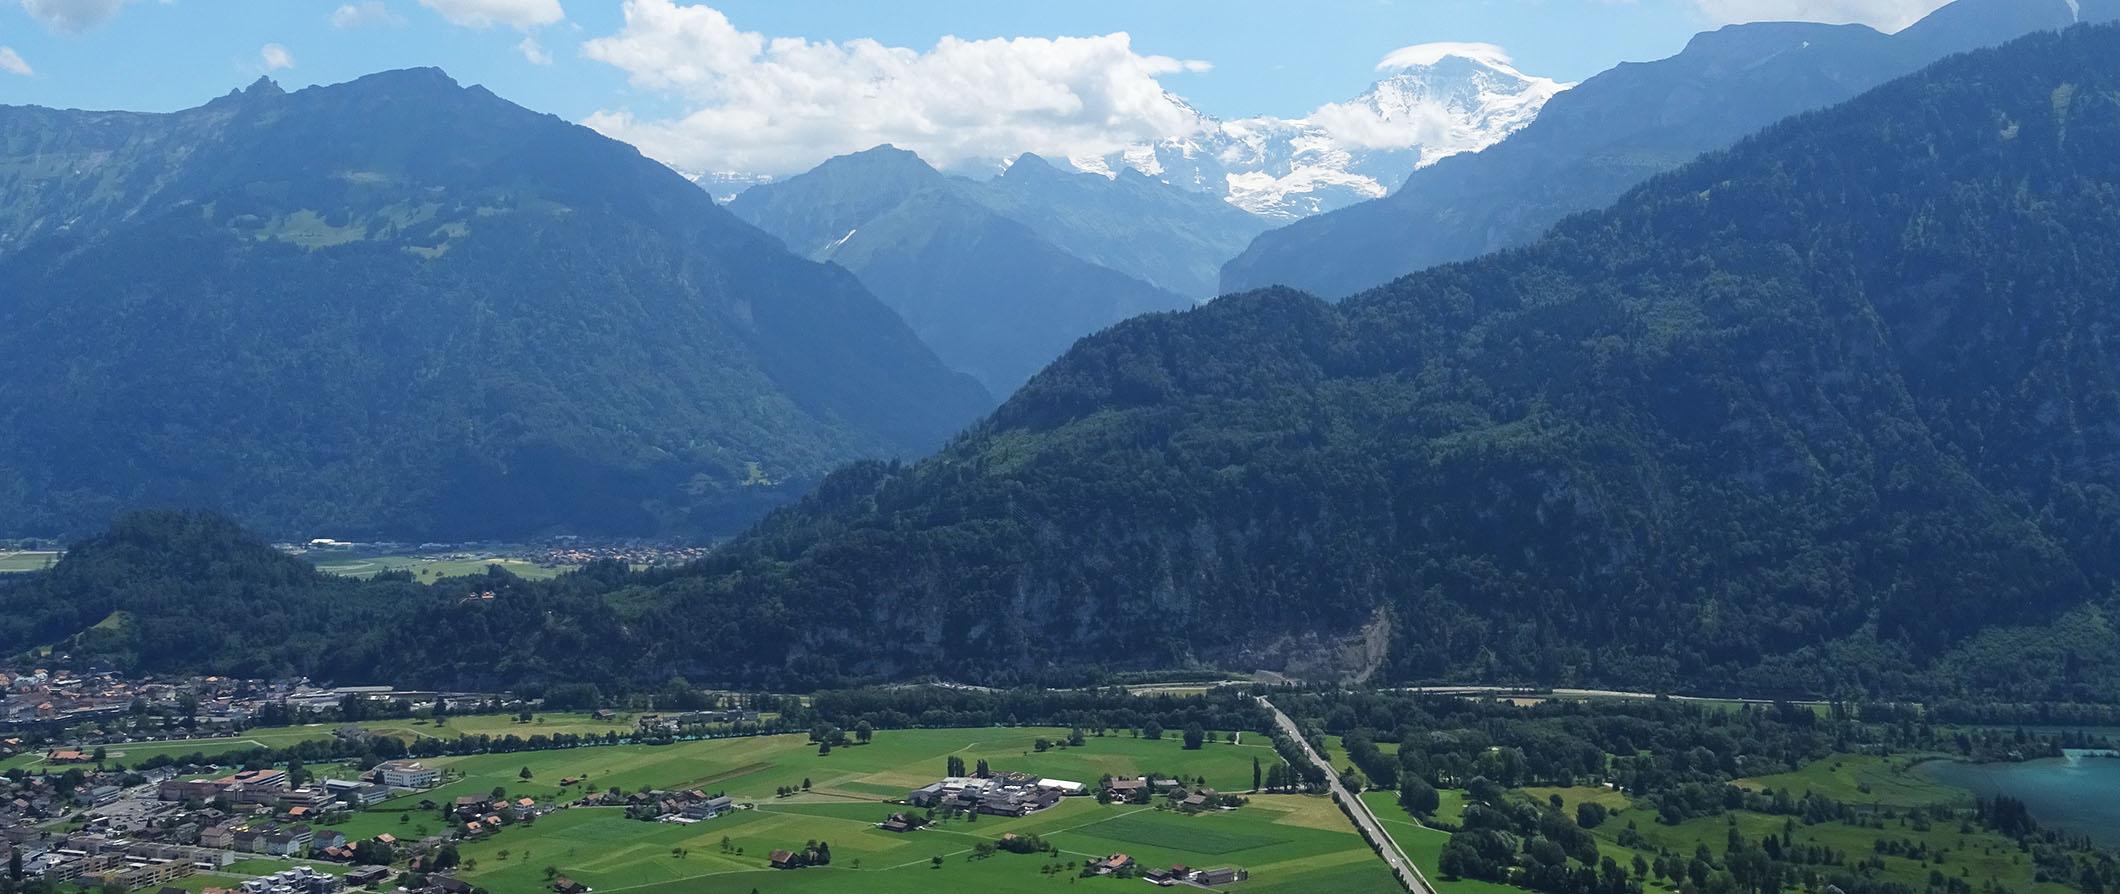 green mountainous landscape in Interlaken, Switzerland